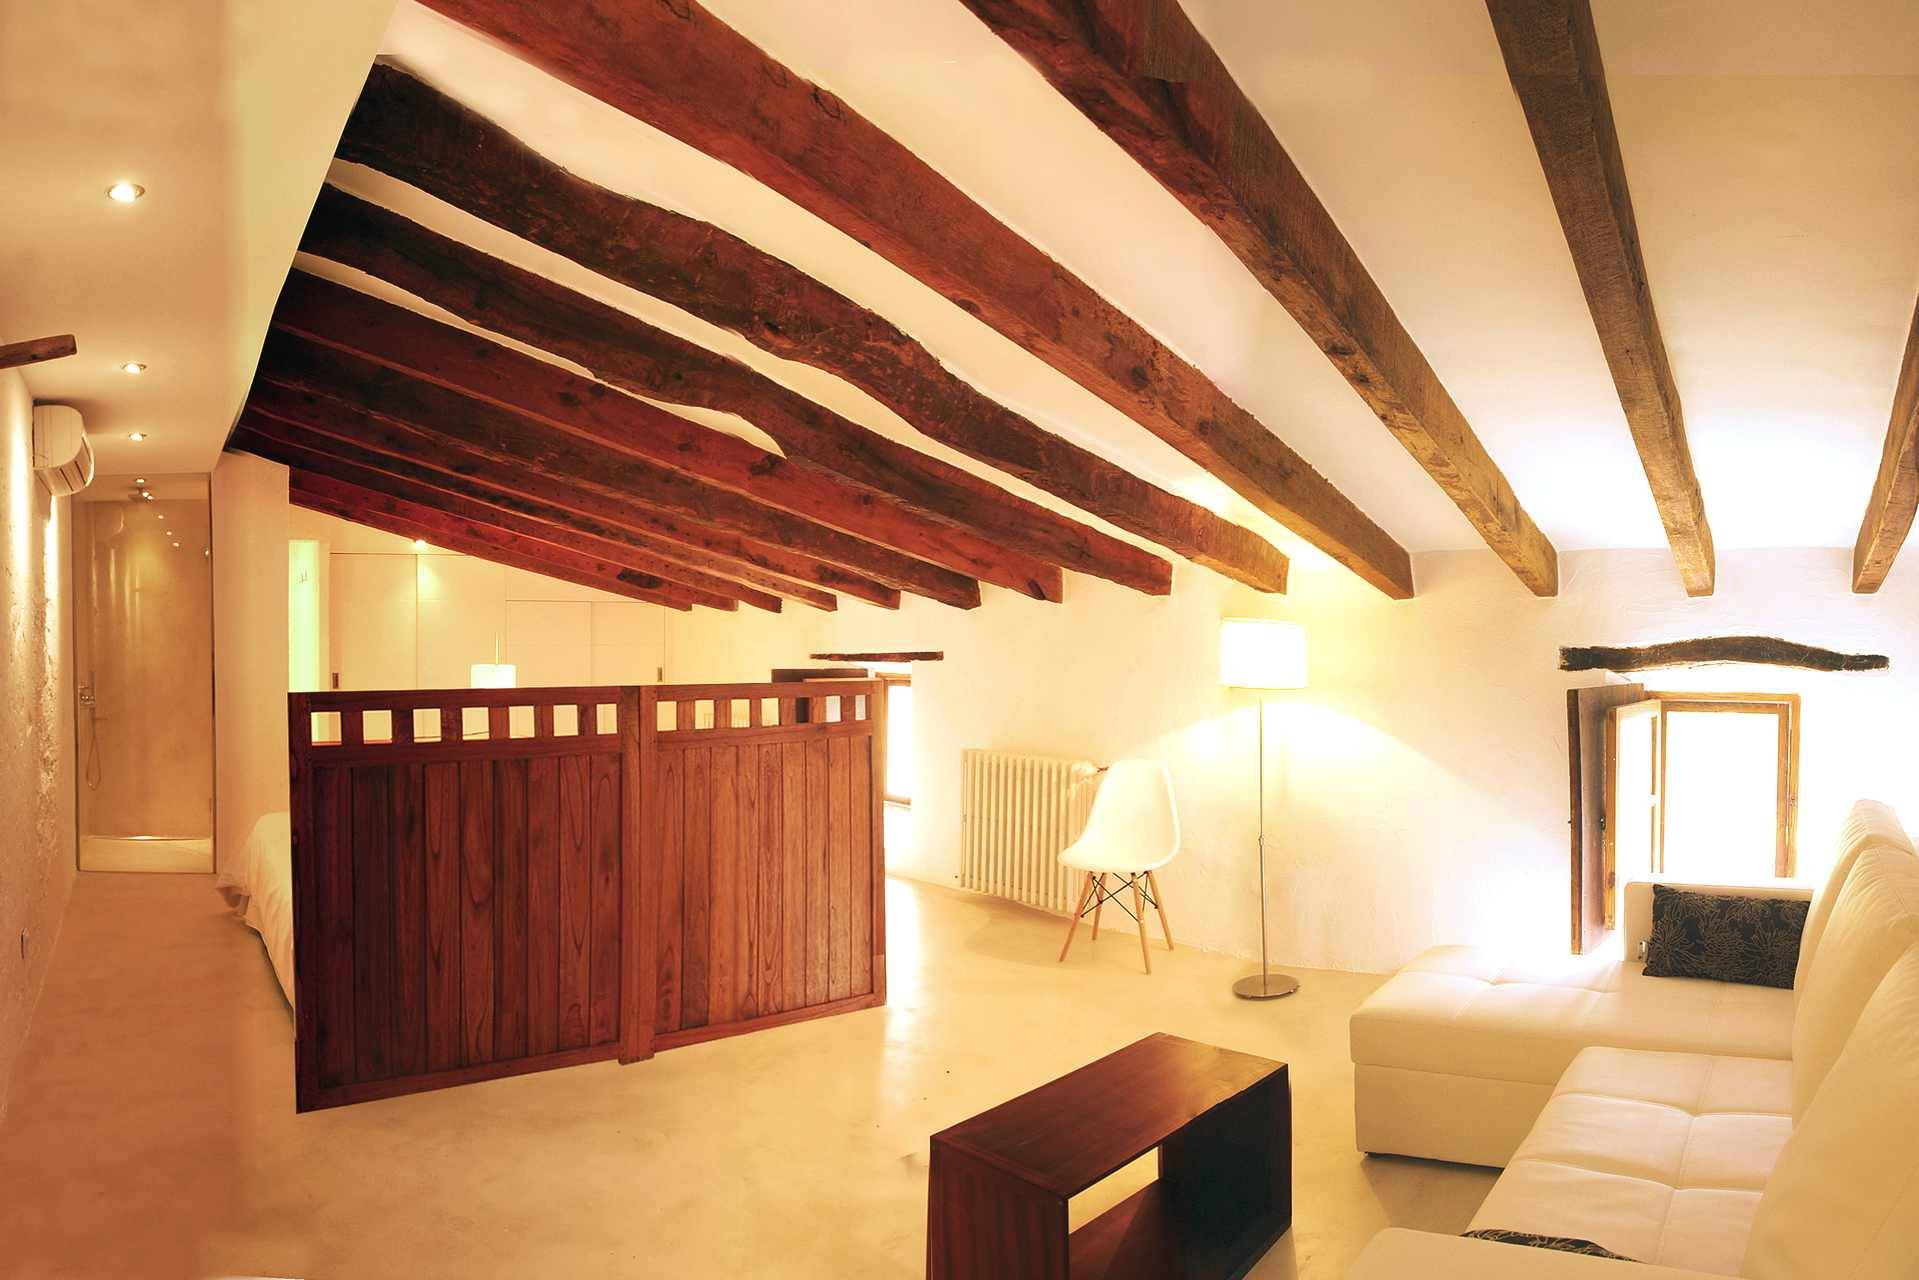 01-06 Charming Holiday Home Mallorca north Bild 25